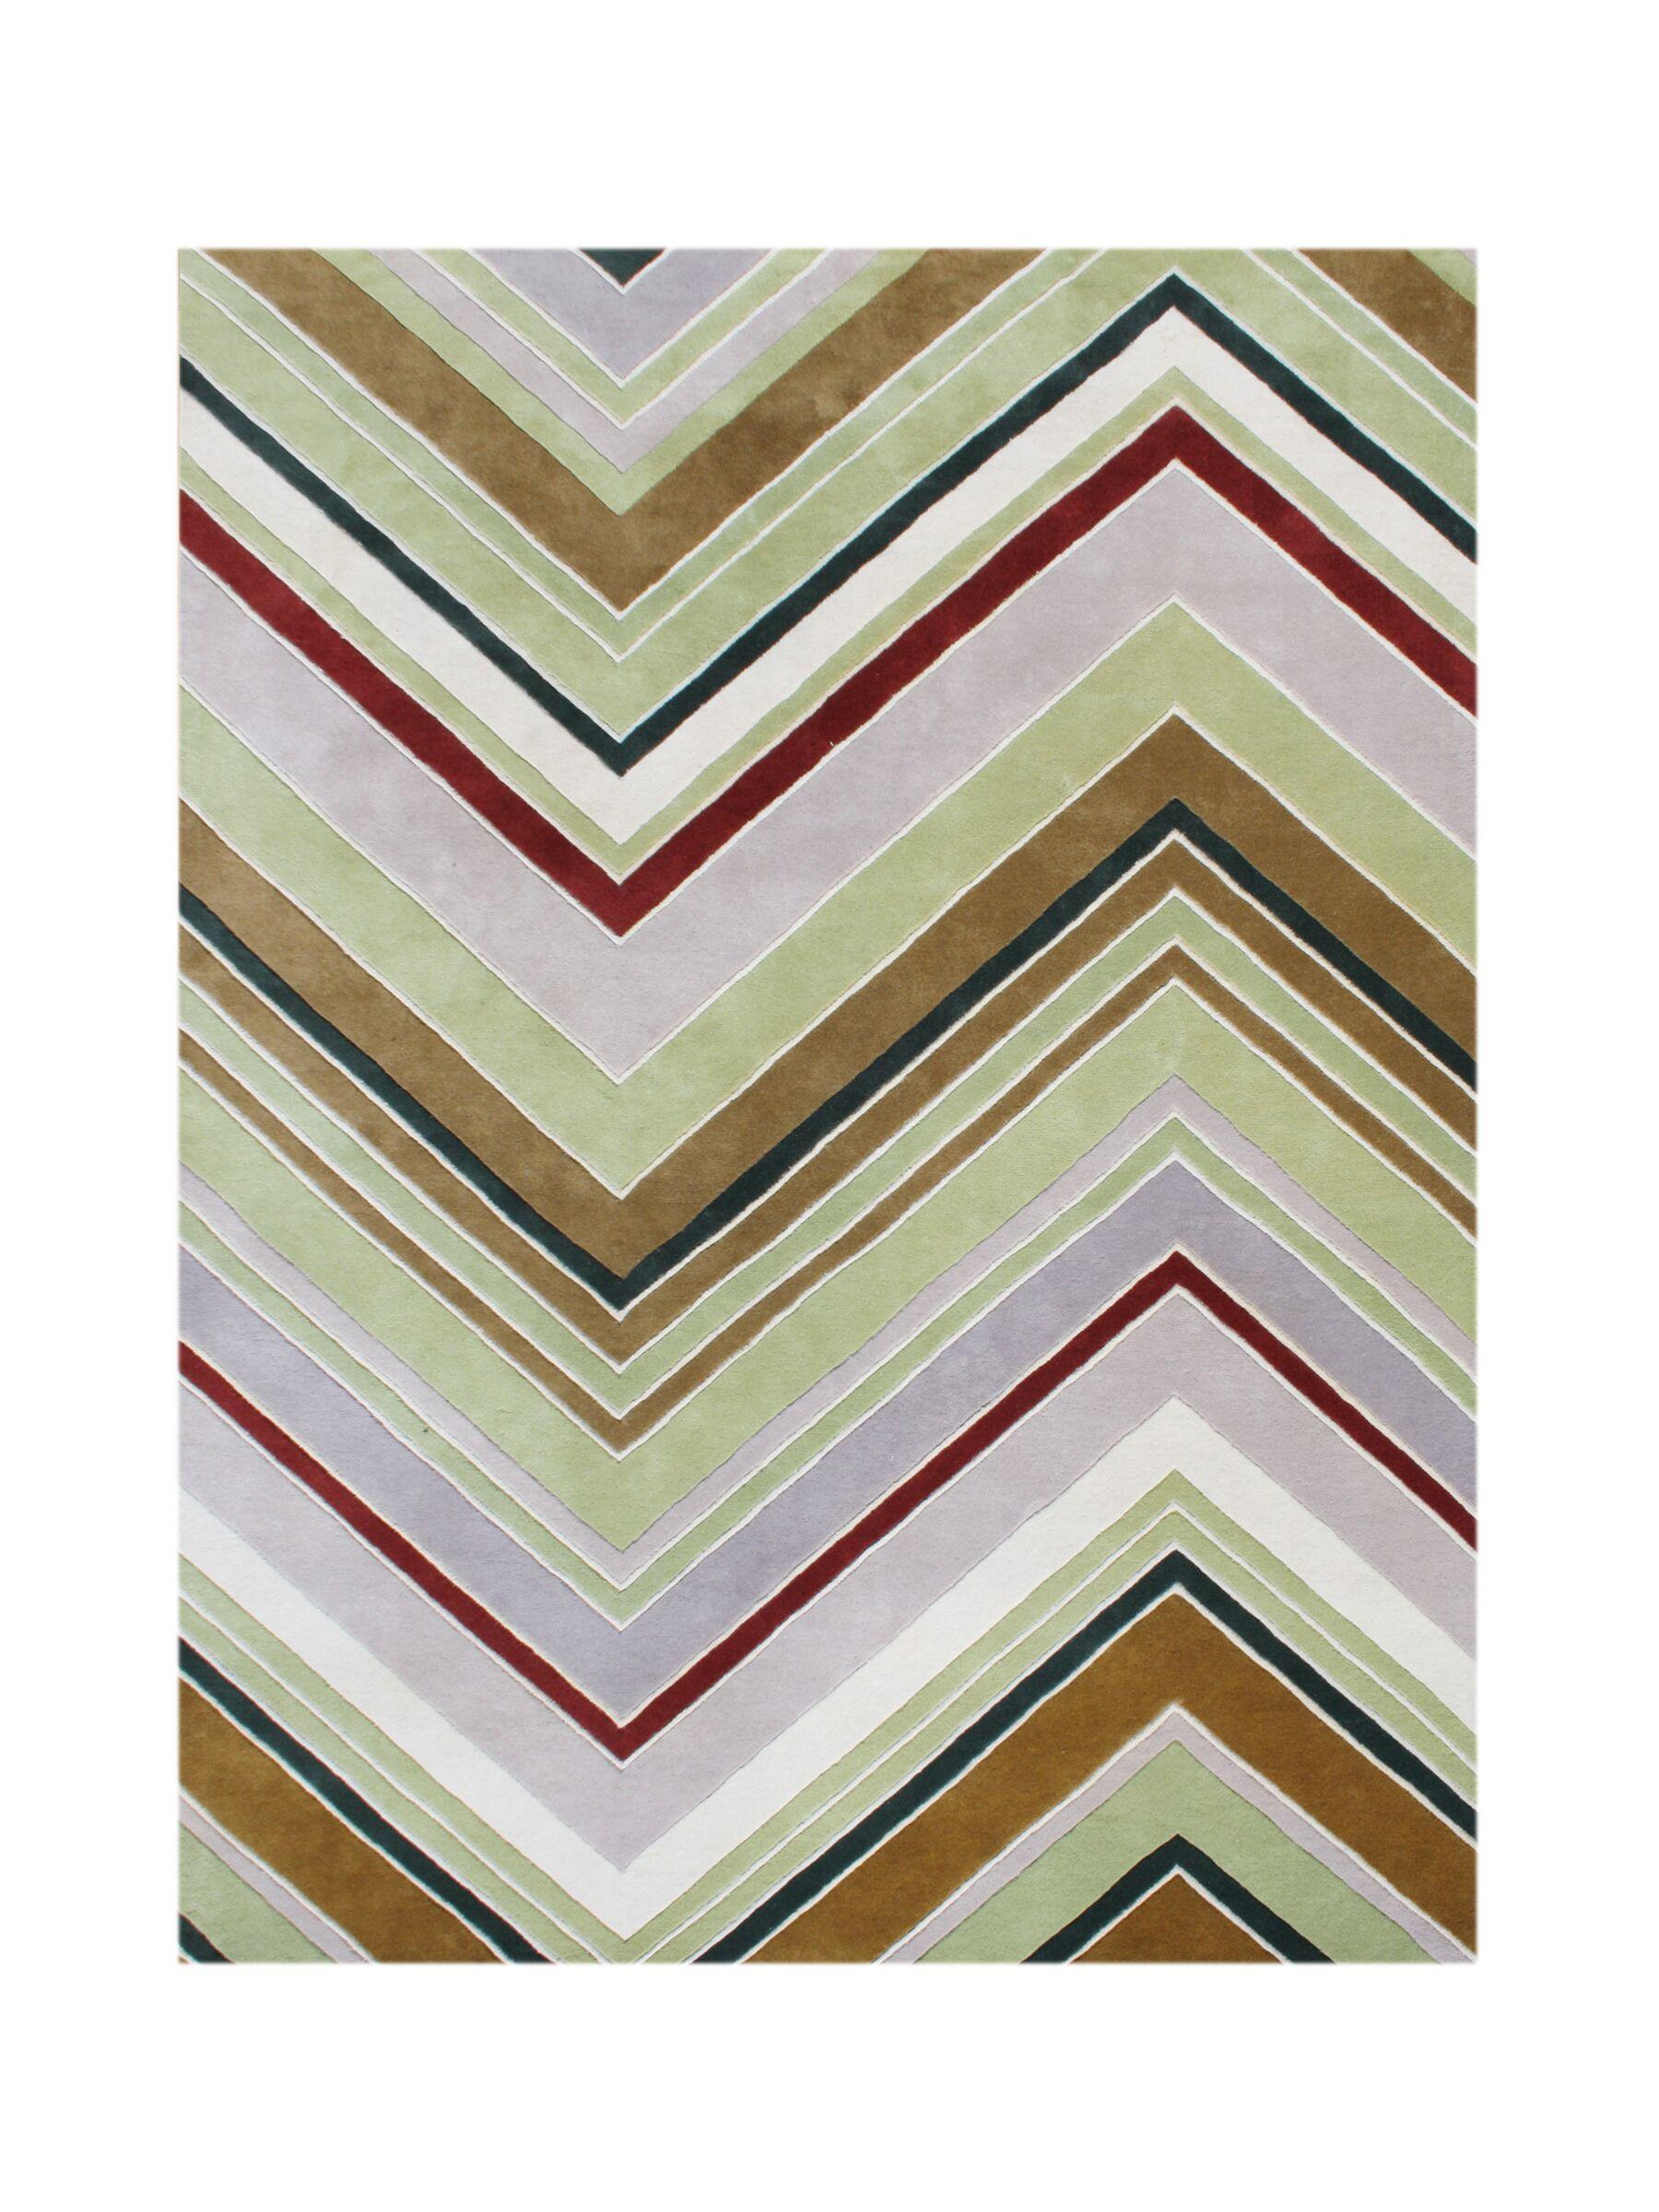 Wyeth Hand-Tufted Area Rug Rug Size: Rectangle 5' x 8'